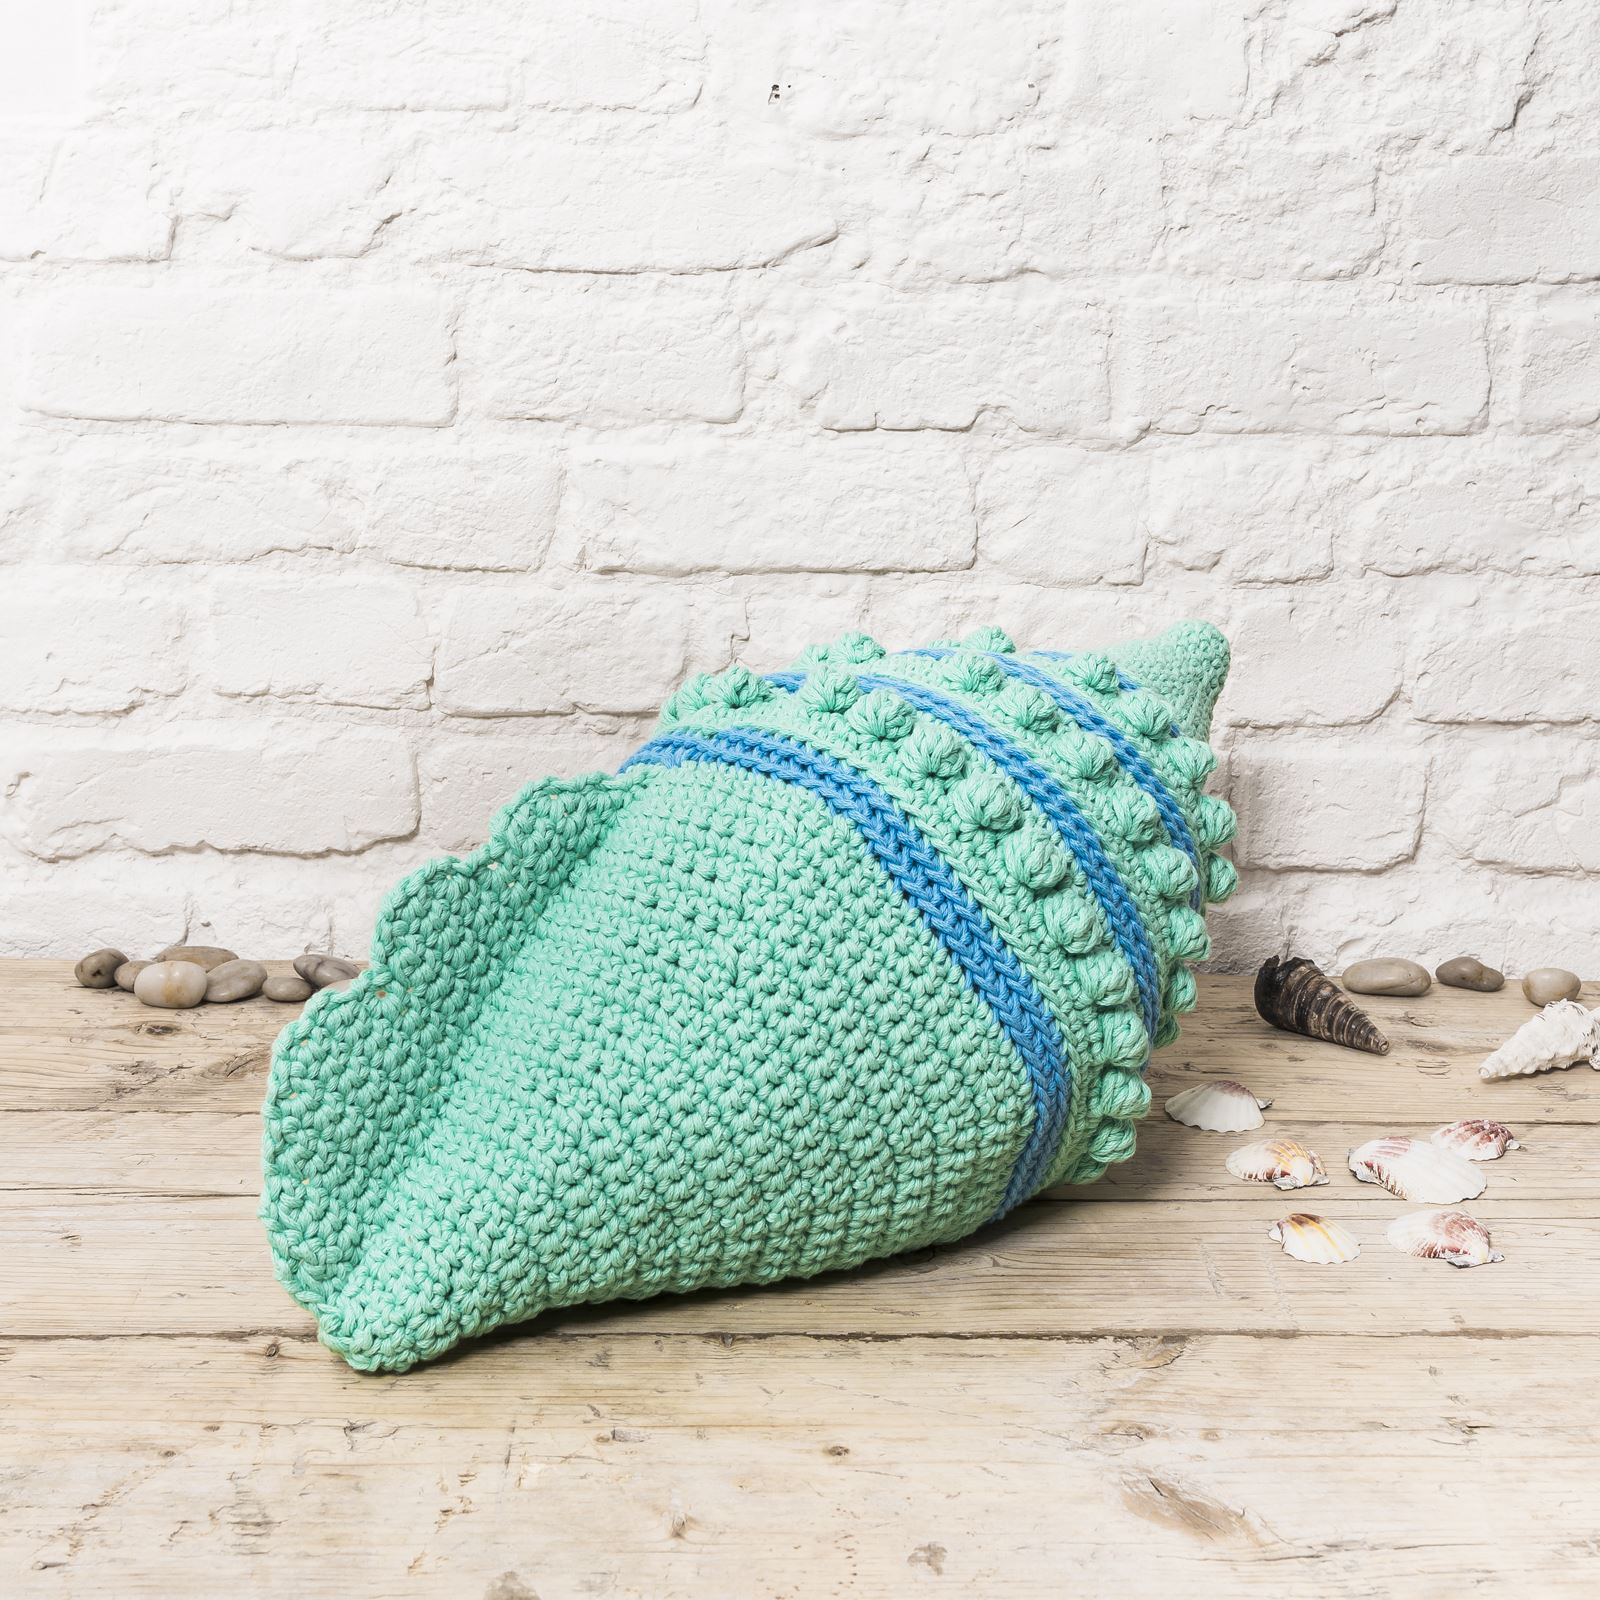 DMC Natura XL Yummy Crochet Patterns Amigurumi Home Decor